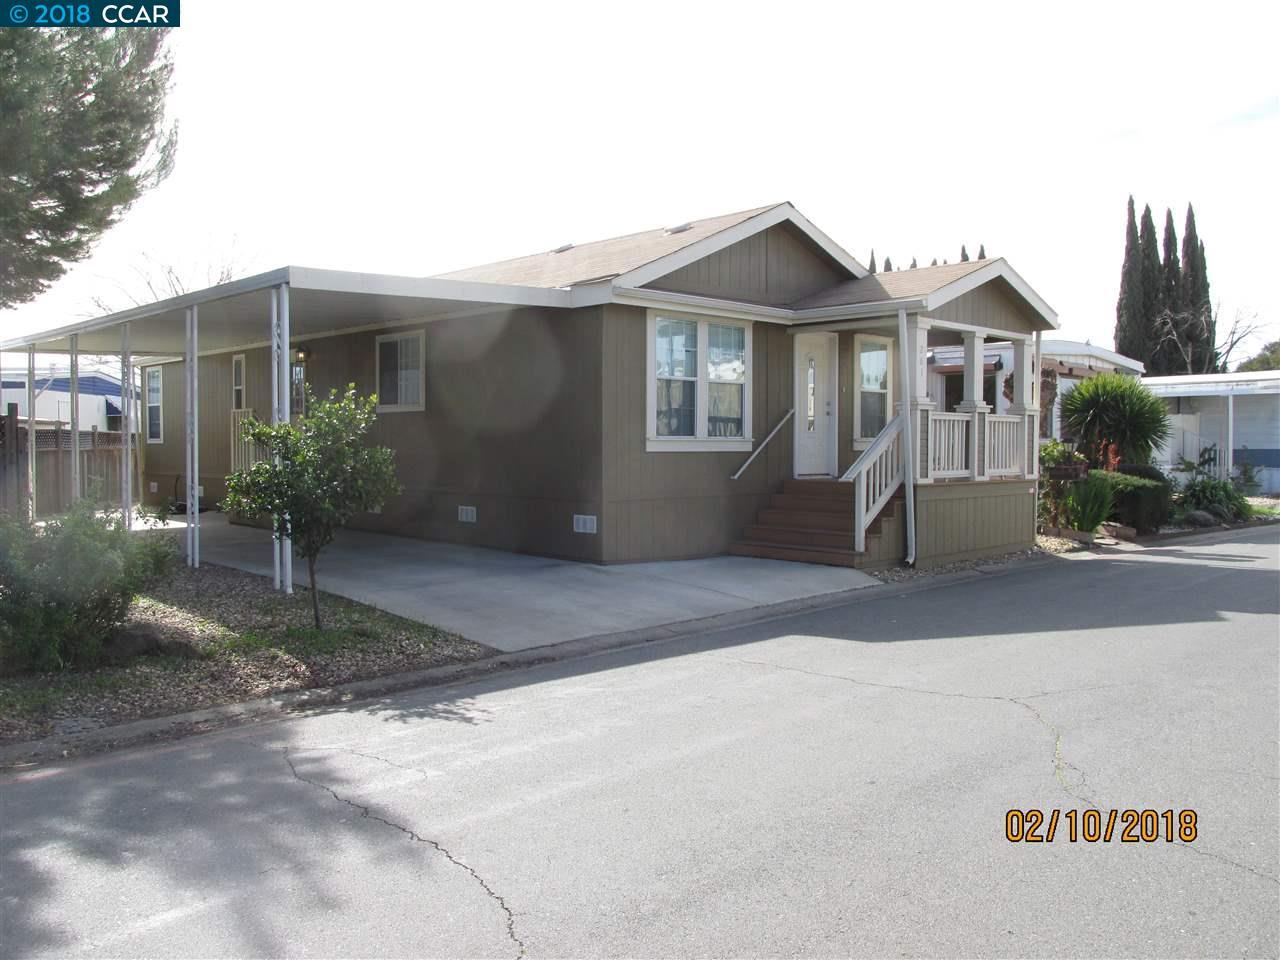 واحد منزل الأسرة للـ Sale في 263 Amate Way 263 Amate Way Pacheco, California 94553 United States